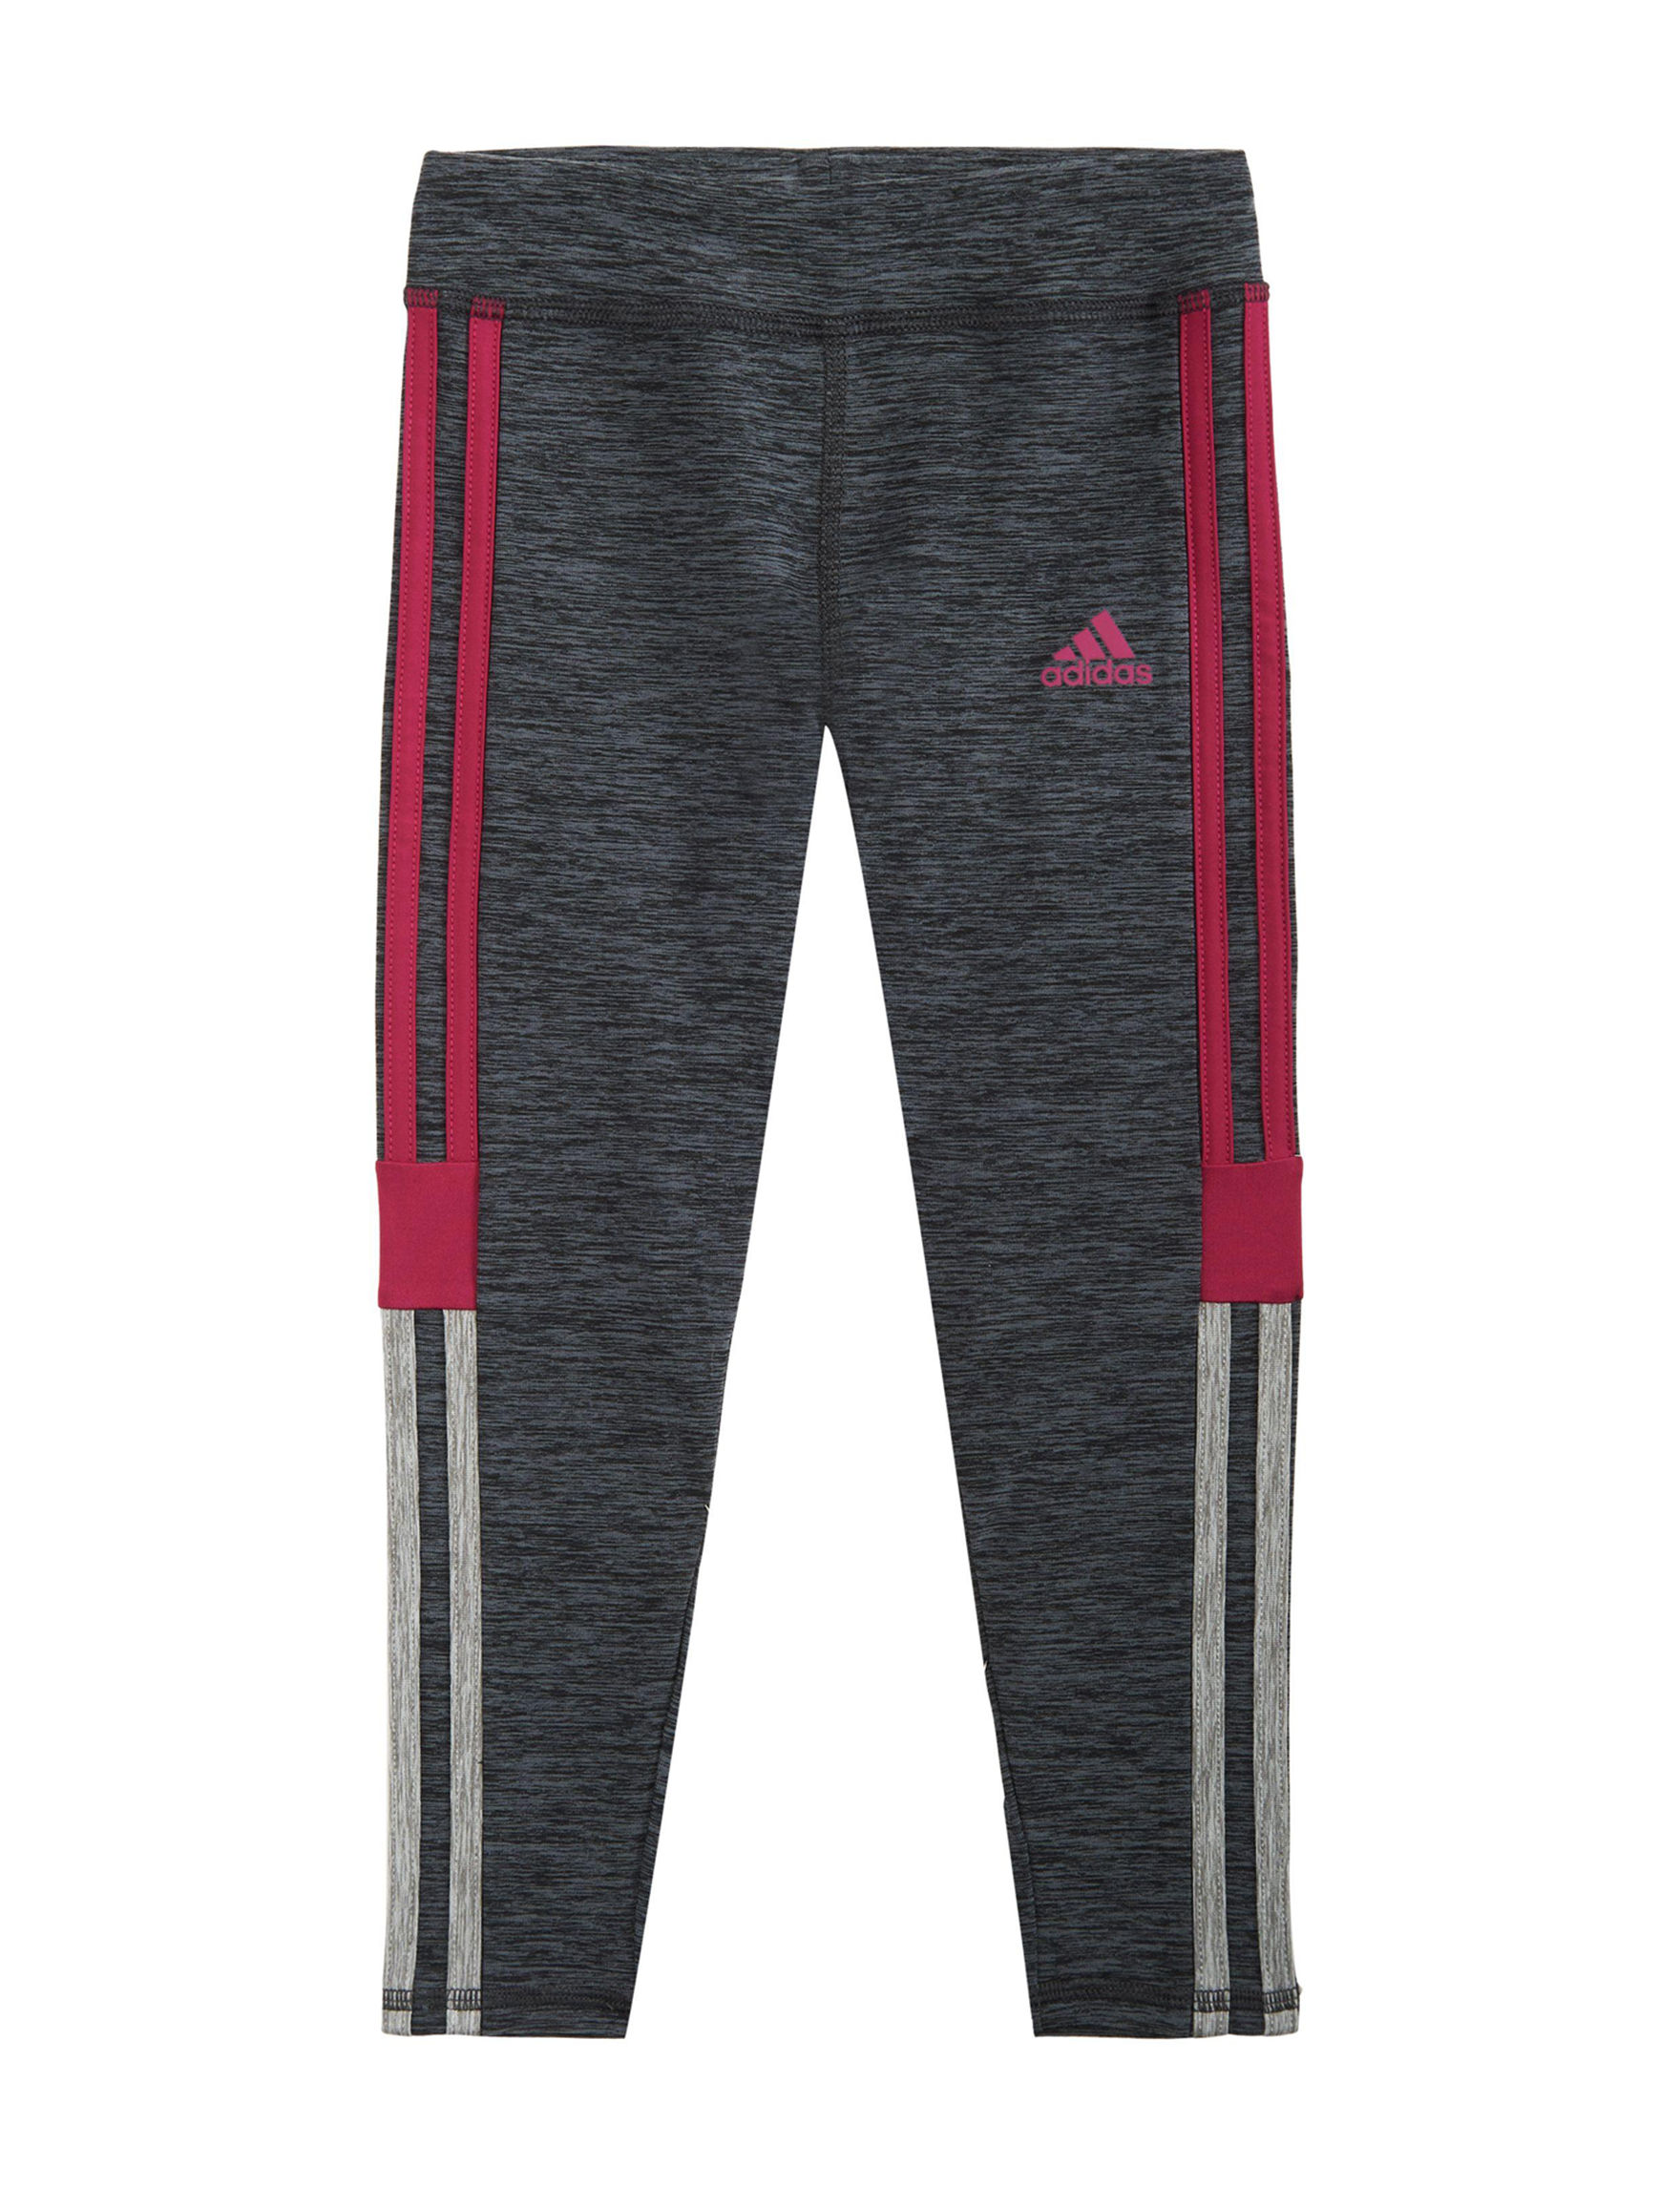 Adidas Dark Heather Grey